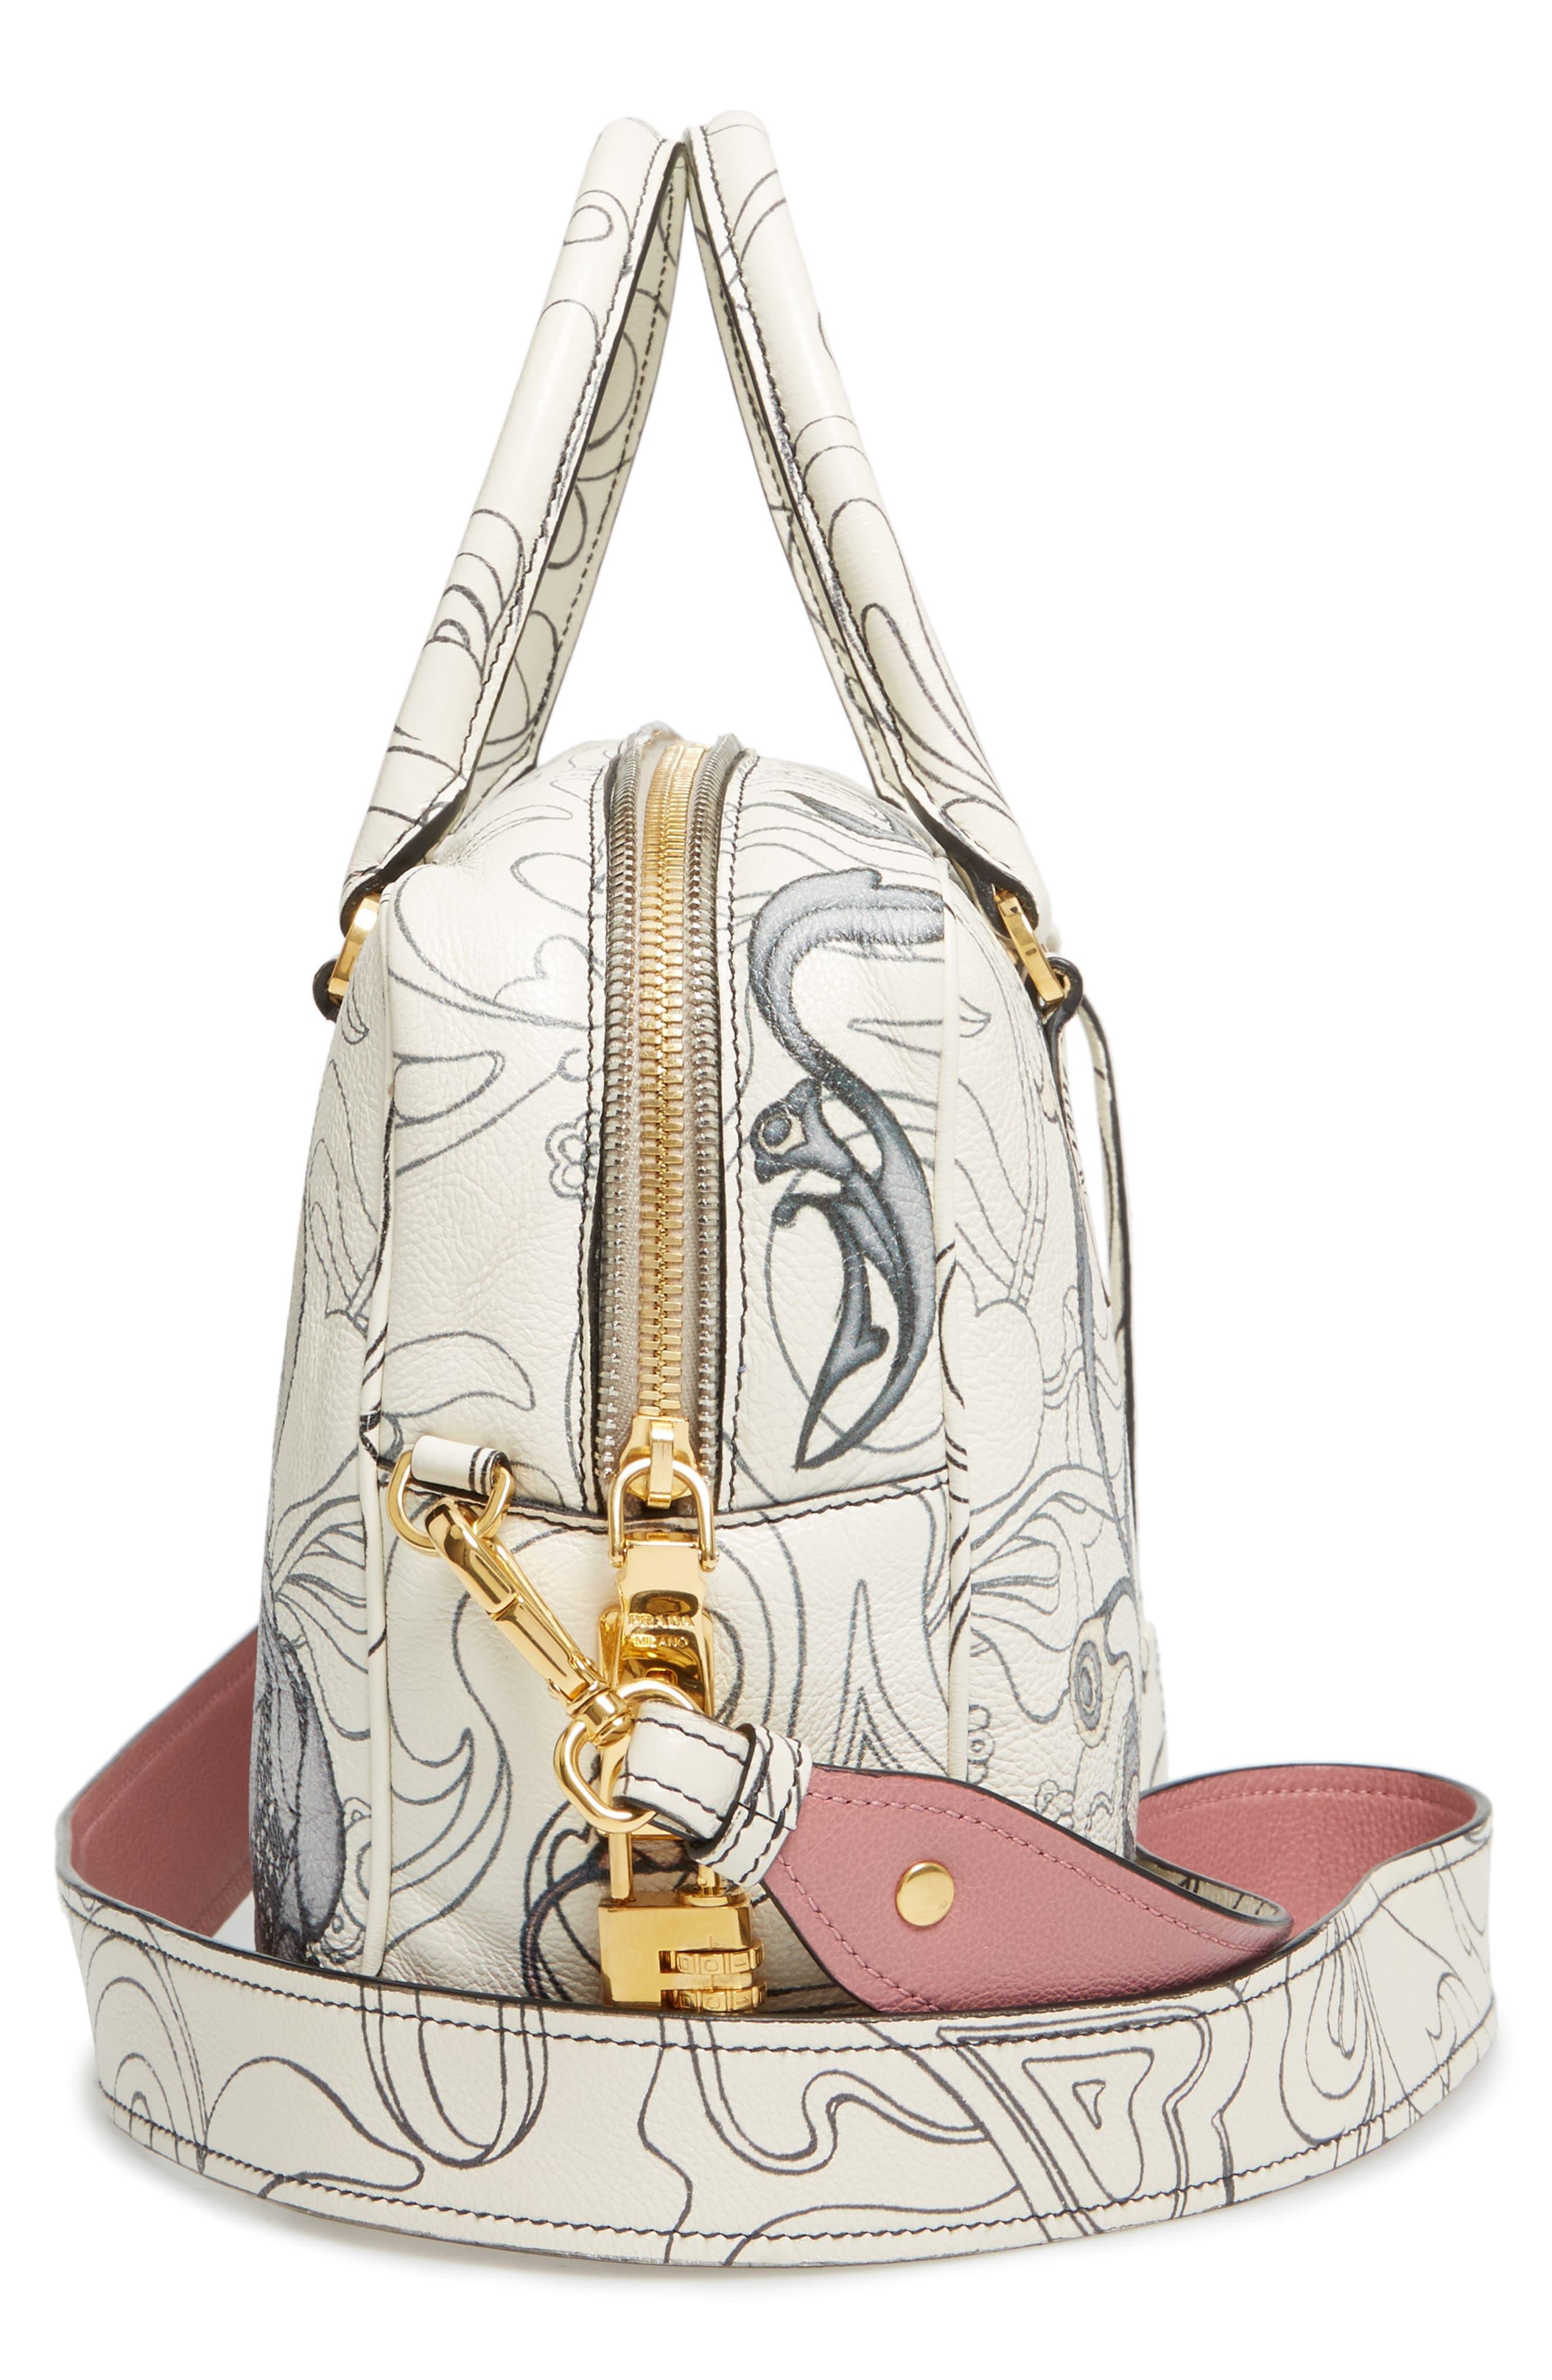 Glace Calfskin Rabbit Bowler Bag,                             Alternate thumbnail 5, color,                             100